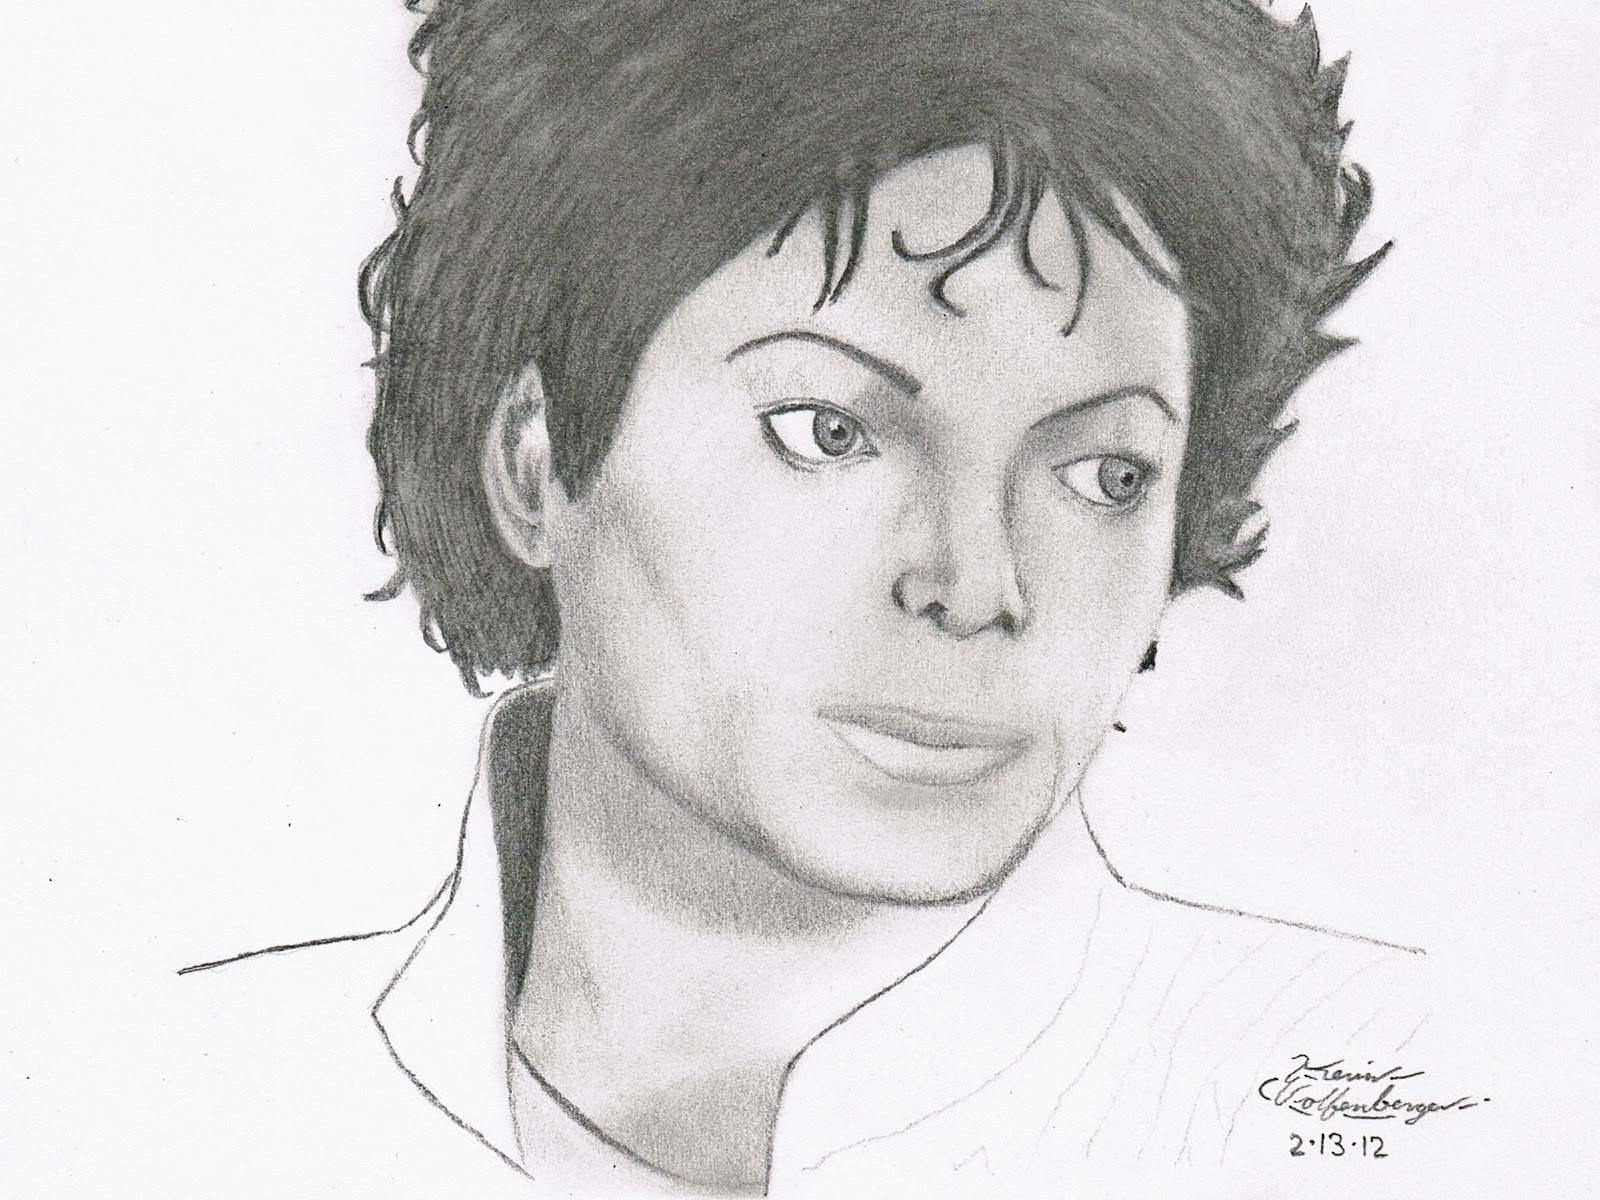 http://1.bp.blogspot.com/-CoW__0gPwMs/UFUnoC1kMLI/AAAAAAAAh0A/LIwIijhi-Po/s1600/Michael+Jackson+Drawing.jpg